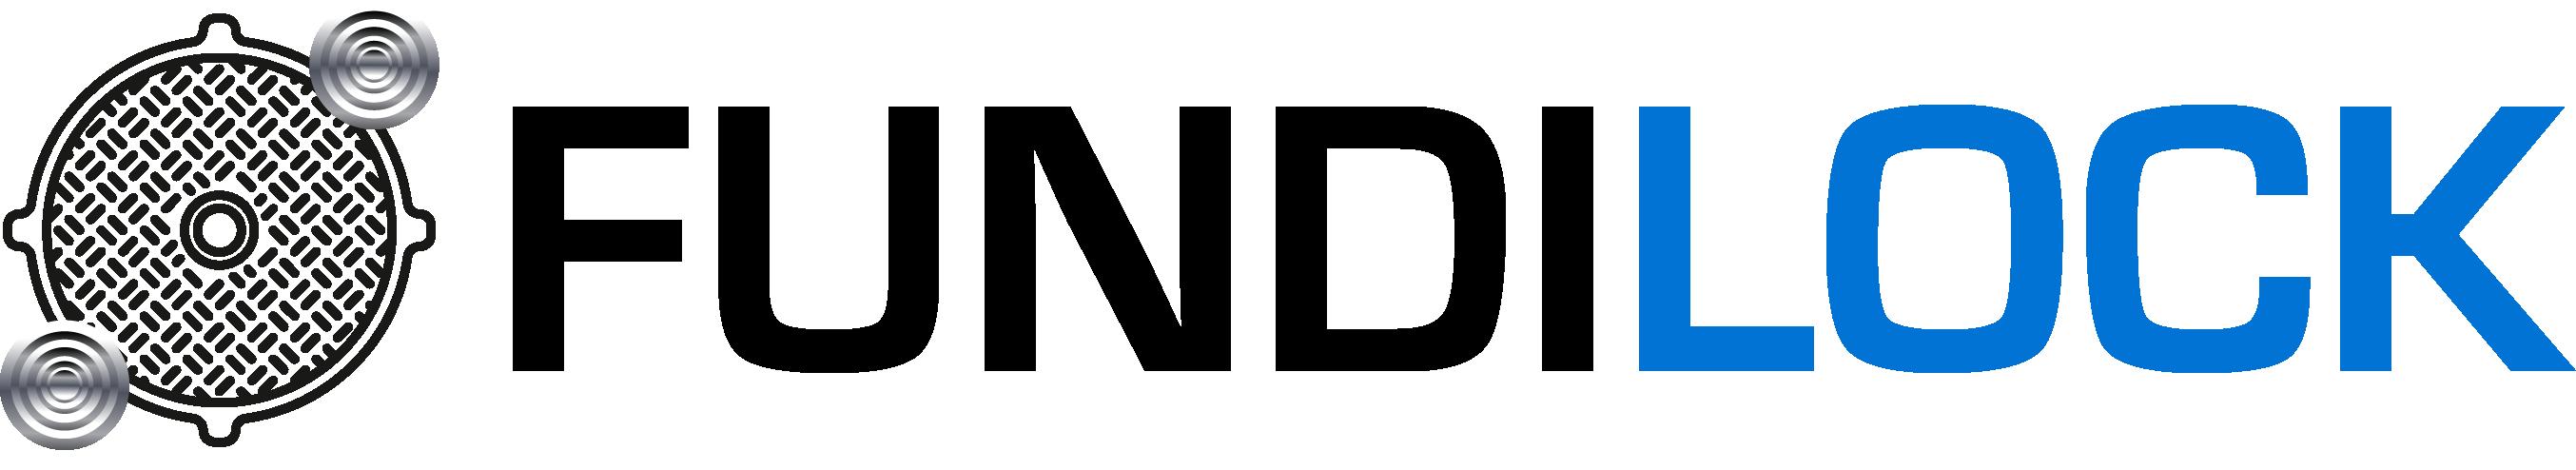 fundilock solución anti robo de tapas de alcantarilla